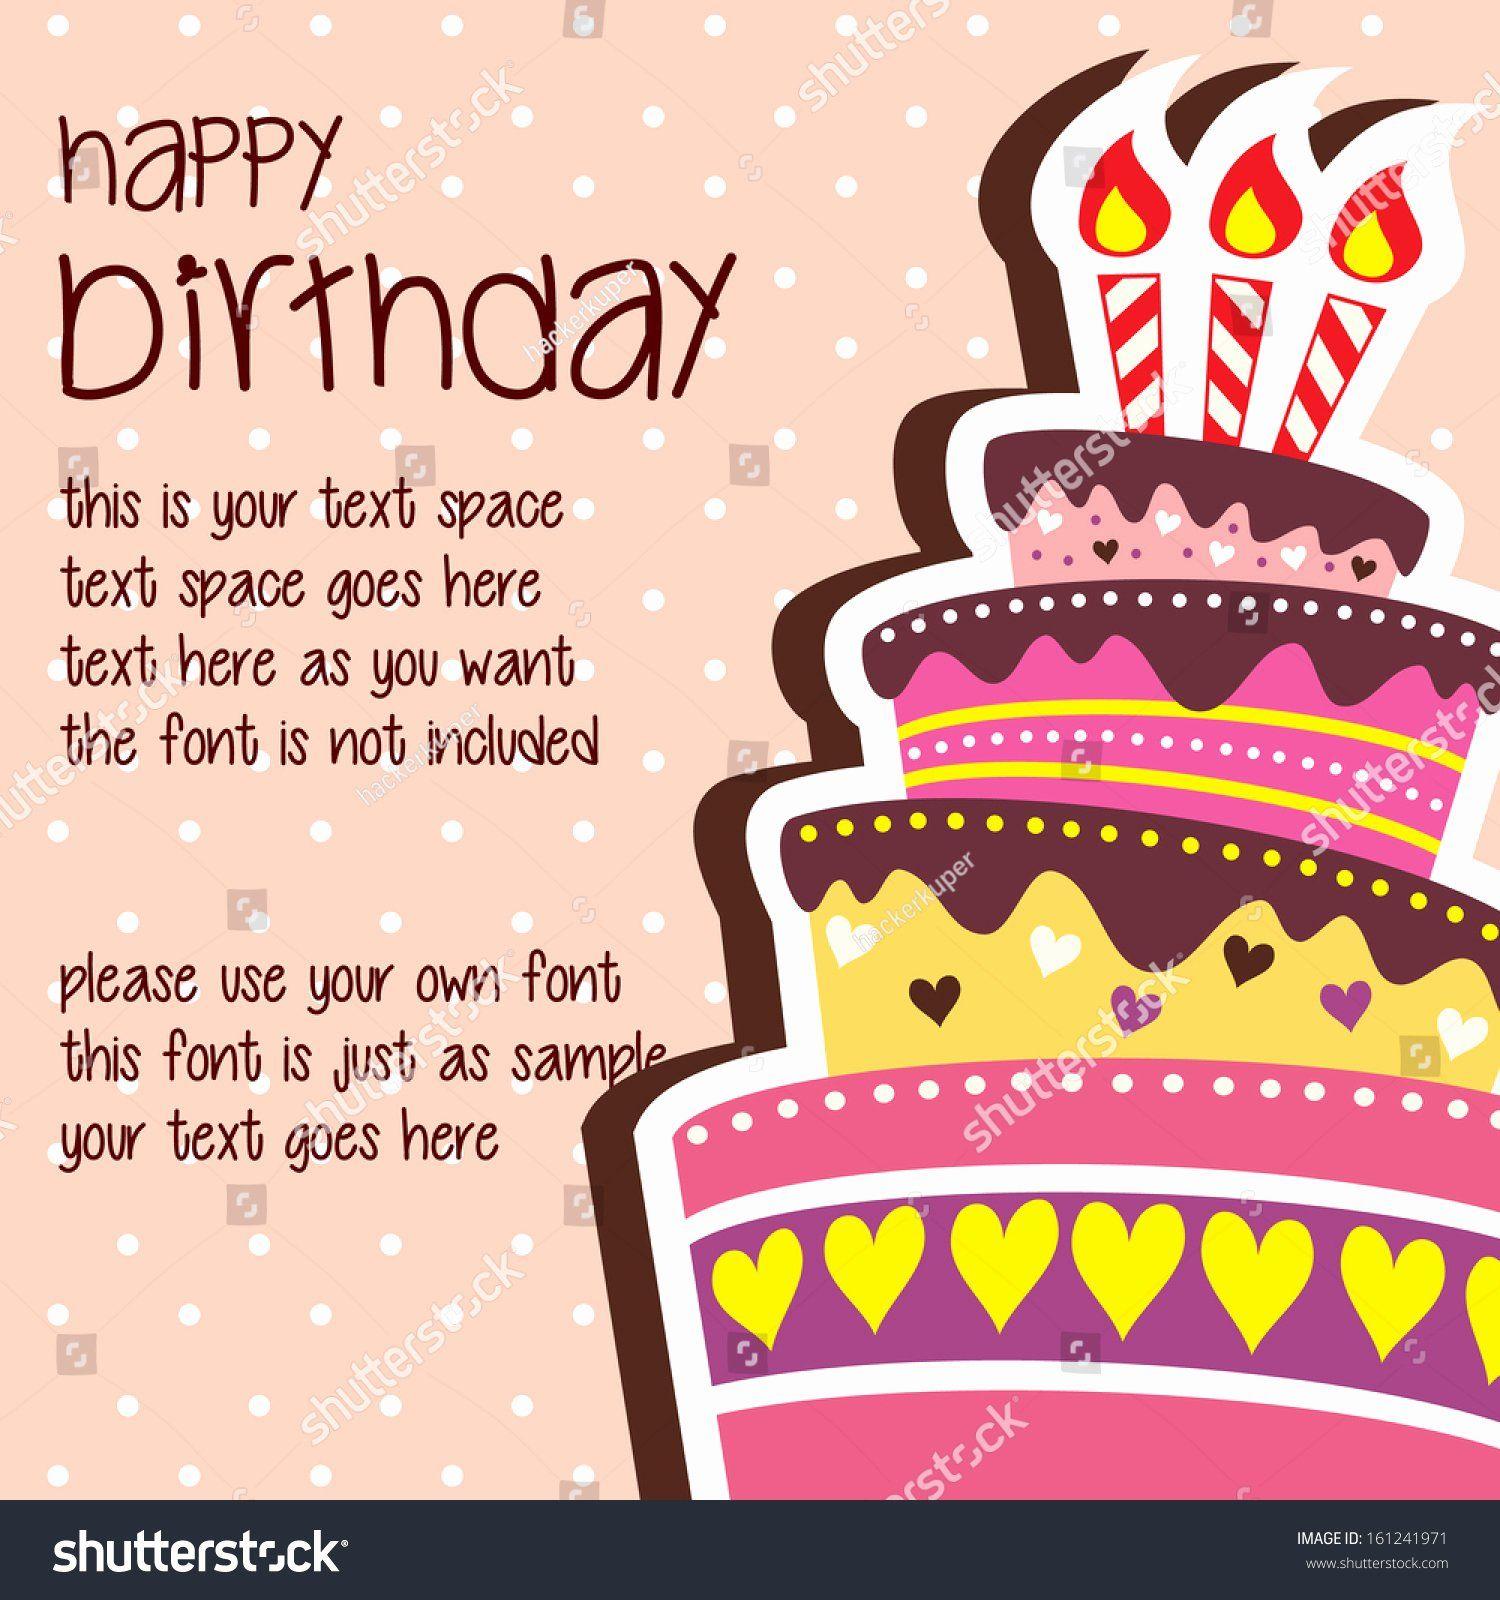 Happy Birthday Card Template Inspirational Birthday Card Template Birthday Card Template Happy Birthday Text Birthday Card Design